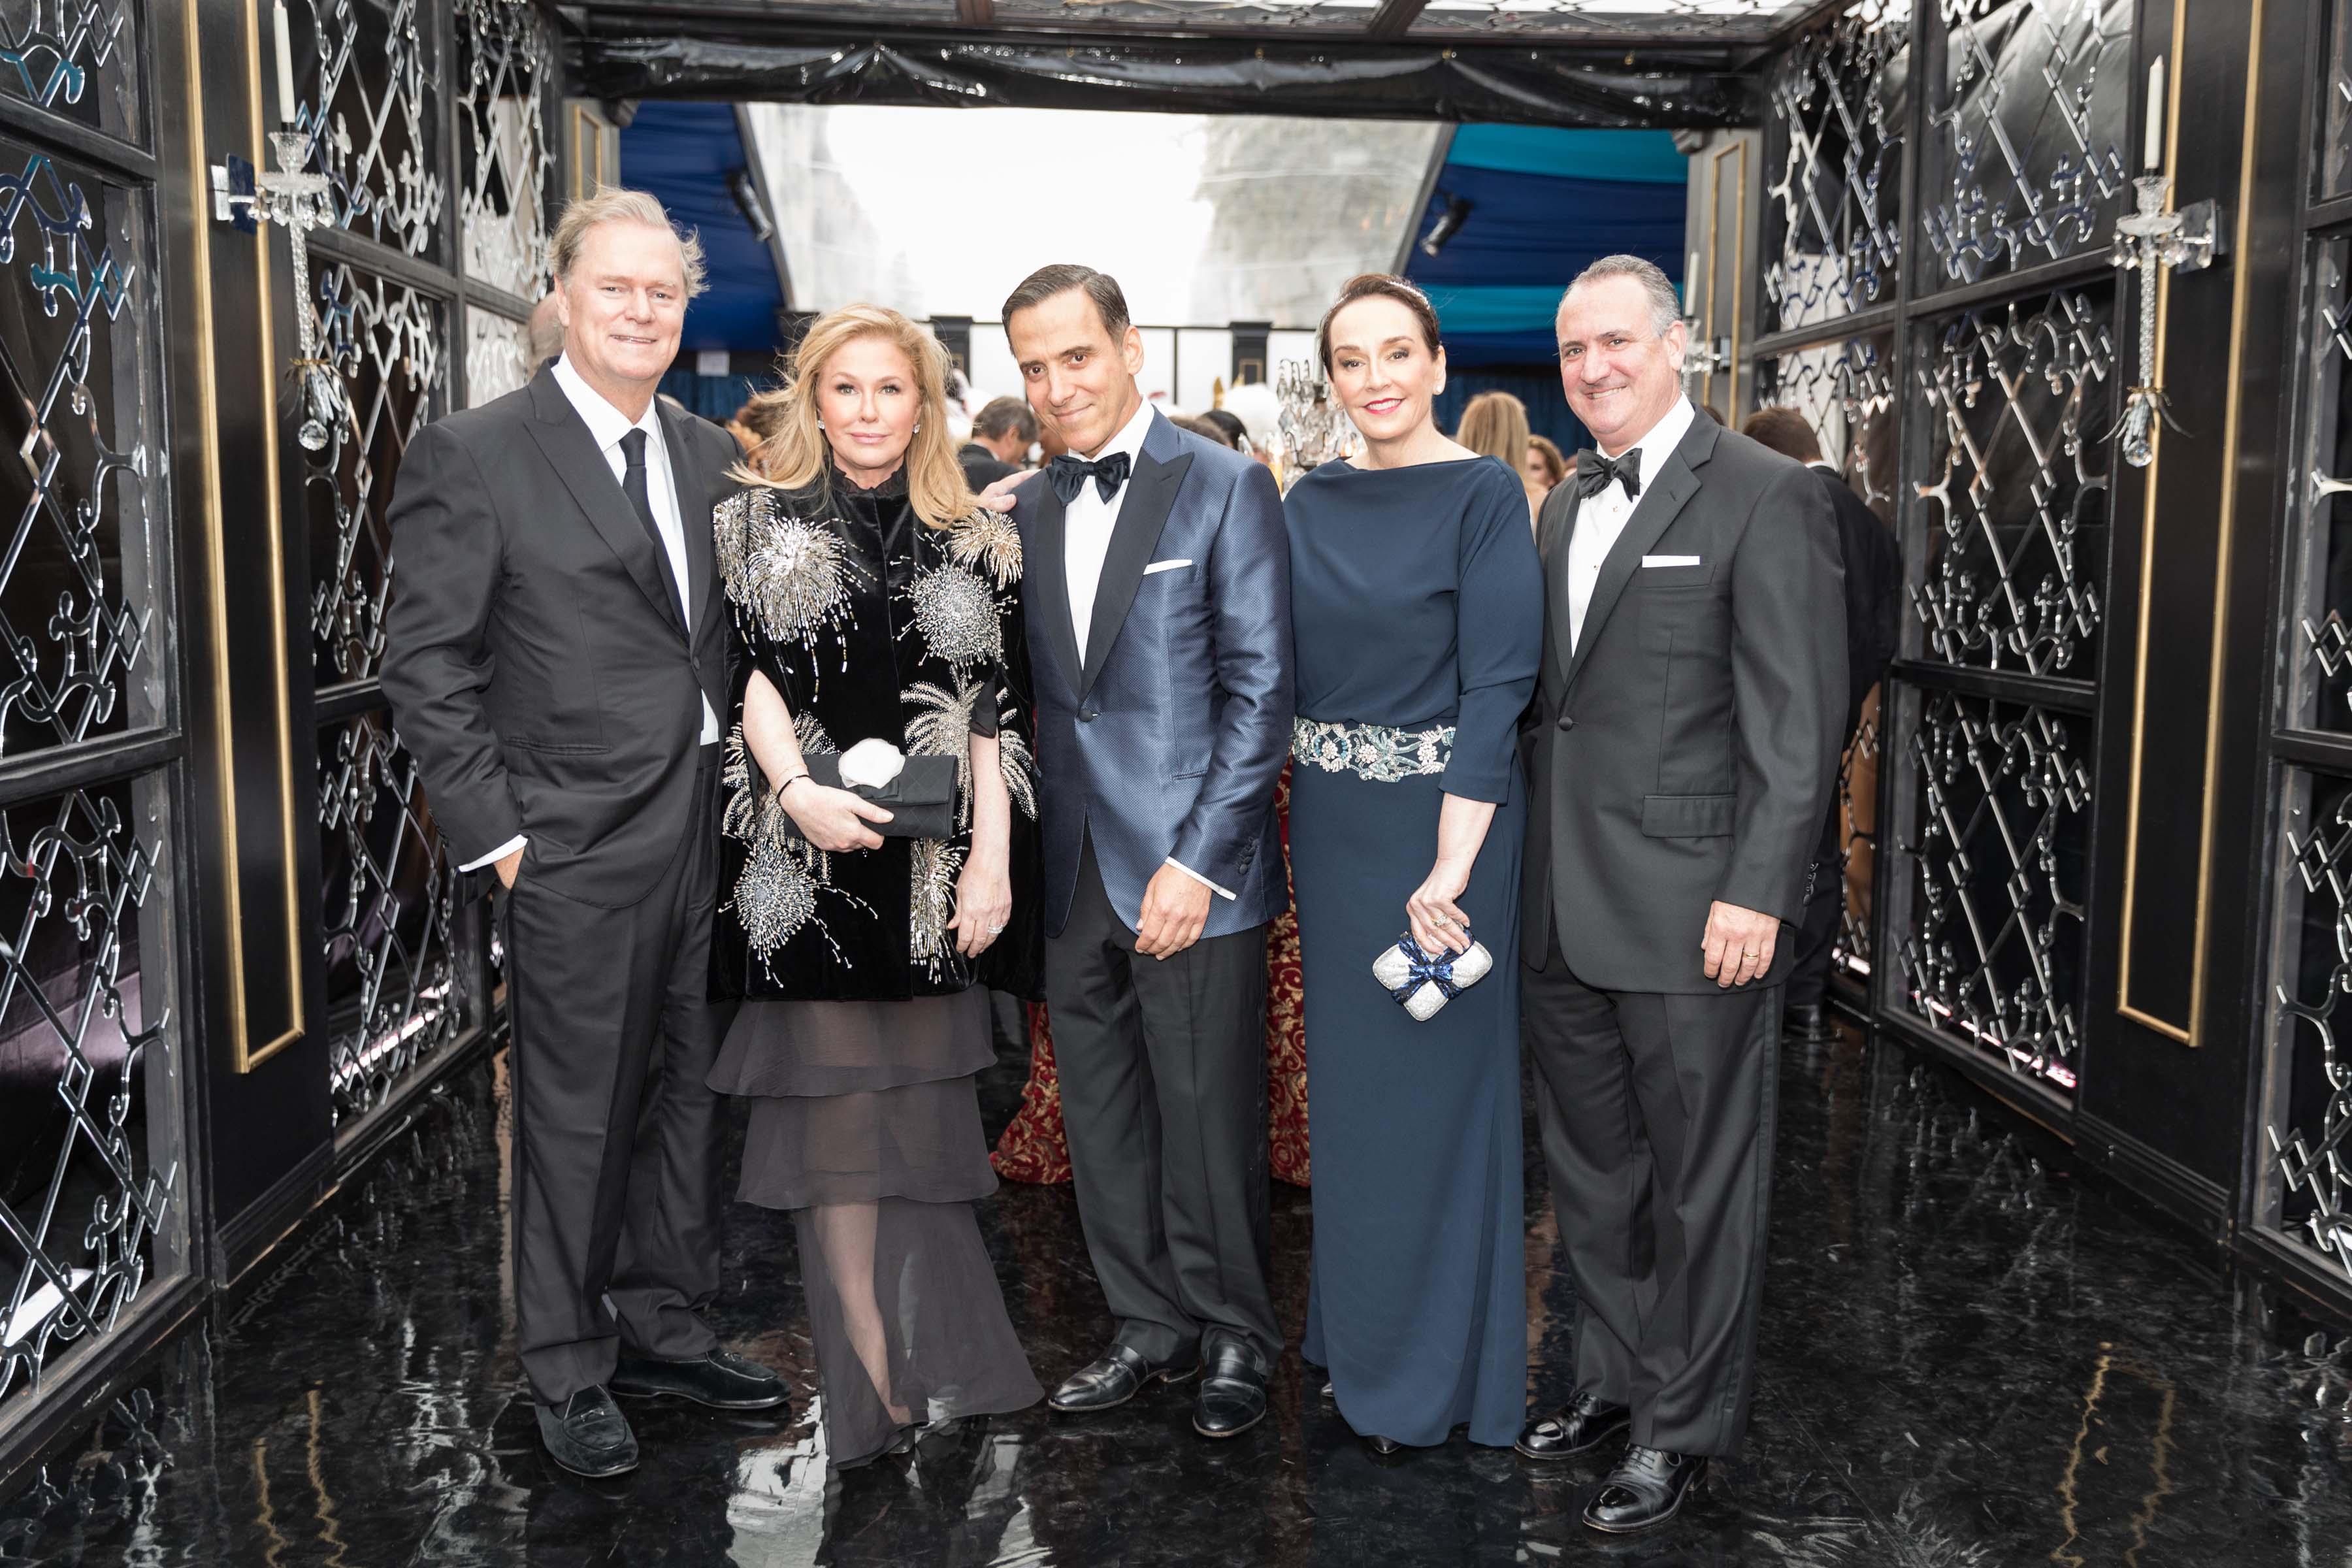 Richard Hilton, Kathy Hilton, Alan Malouf, Elisa Stephens, Ed Conlon